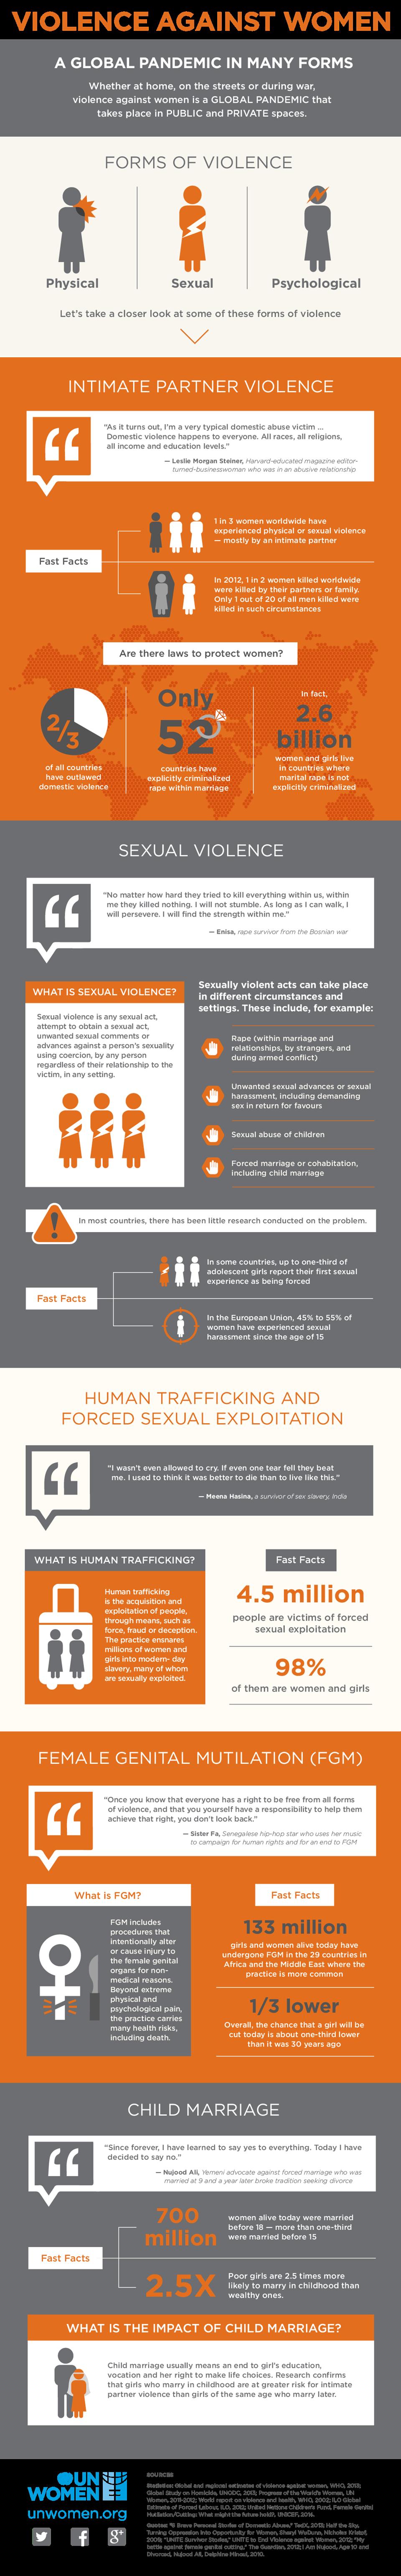 infographic-violence-against-women-en